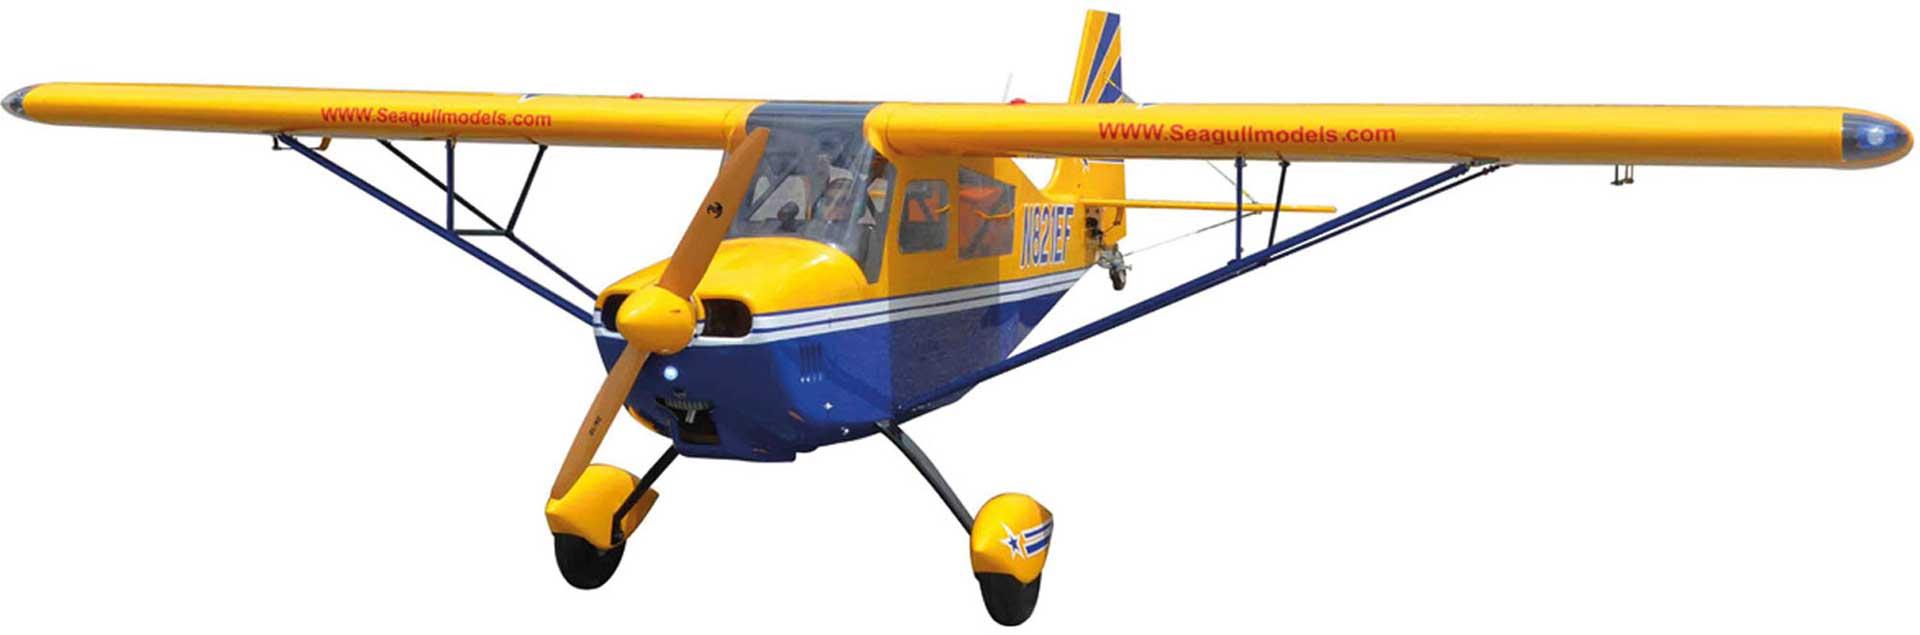 Seagull Models ( SG-Models ) DECATHLON 60-85CC 3D ARF GELB 3,1M